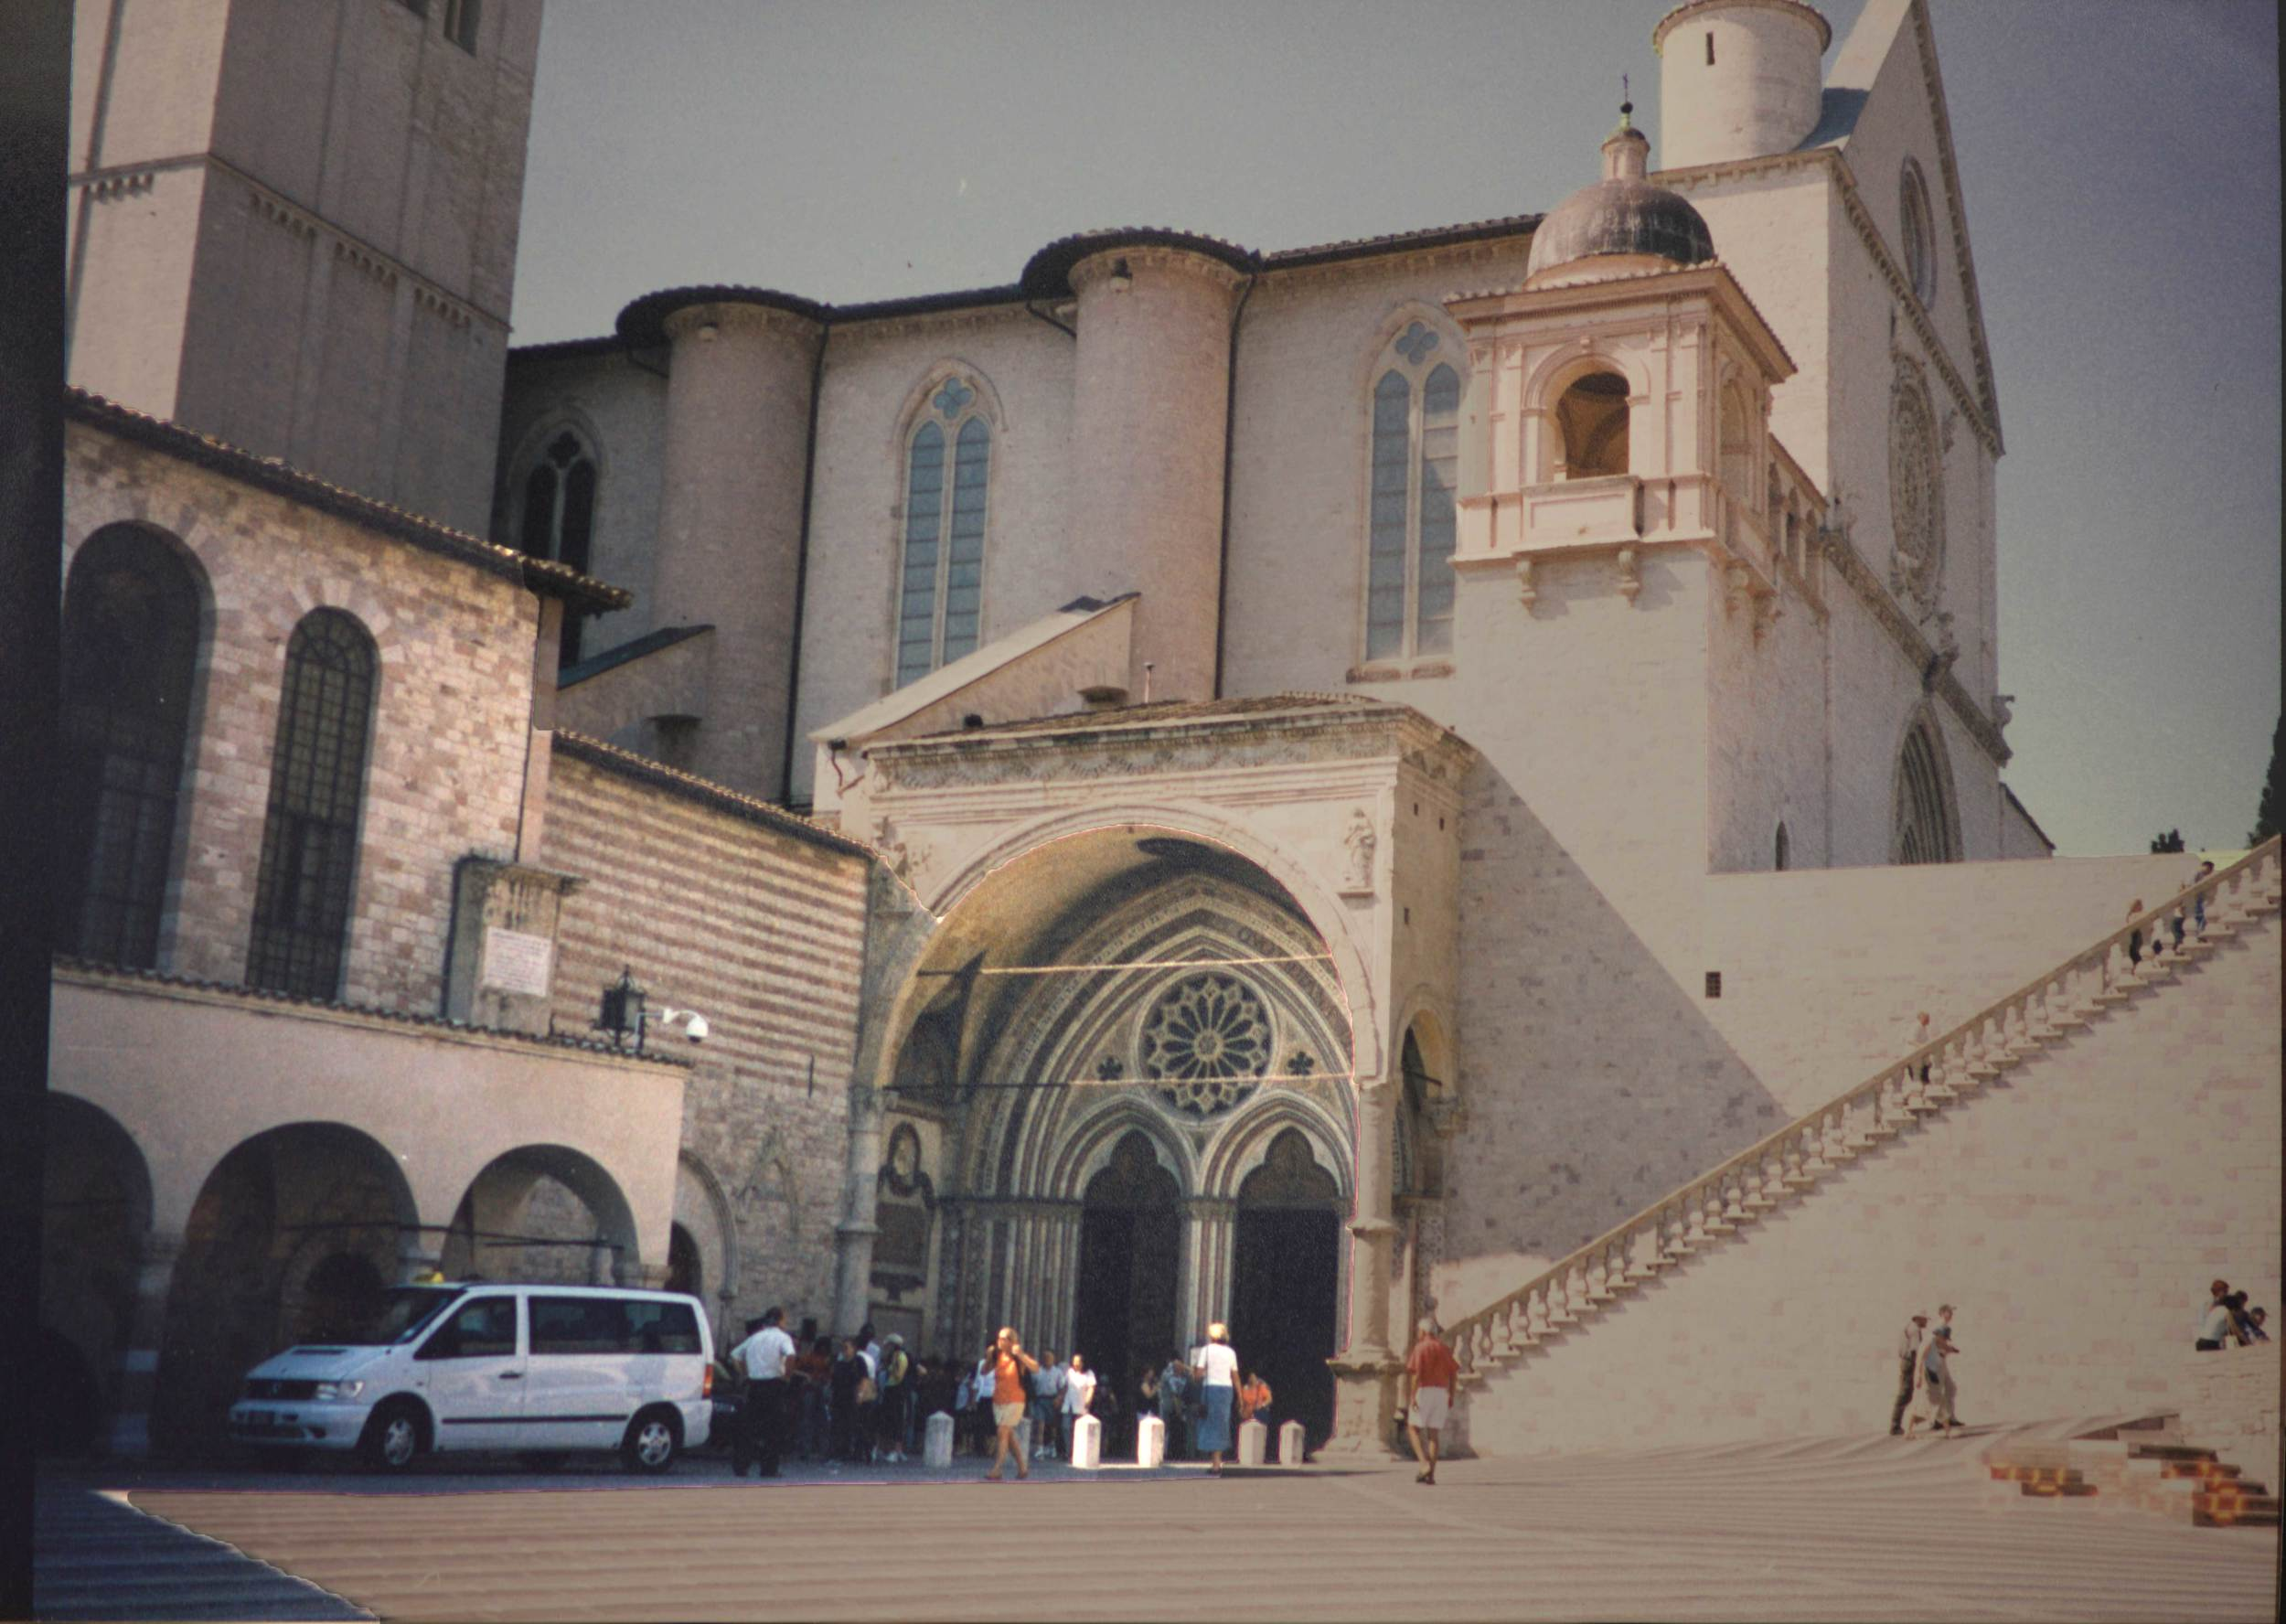 Basilica of San Francesco, Assisi, Italy.Image©sourcingstyle.com